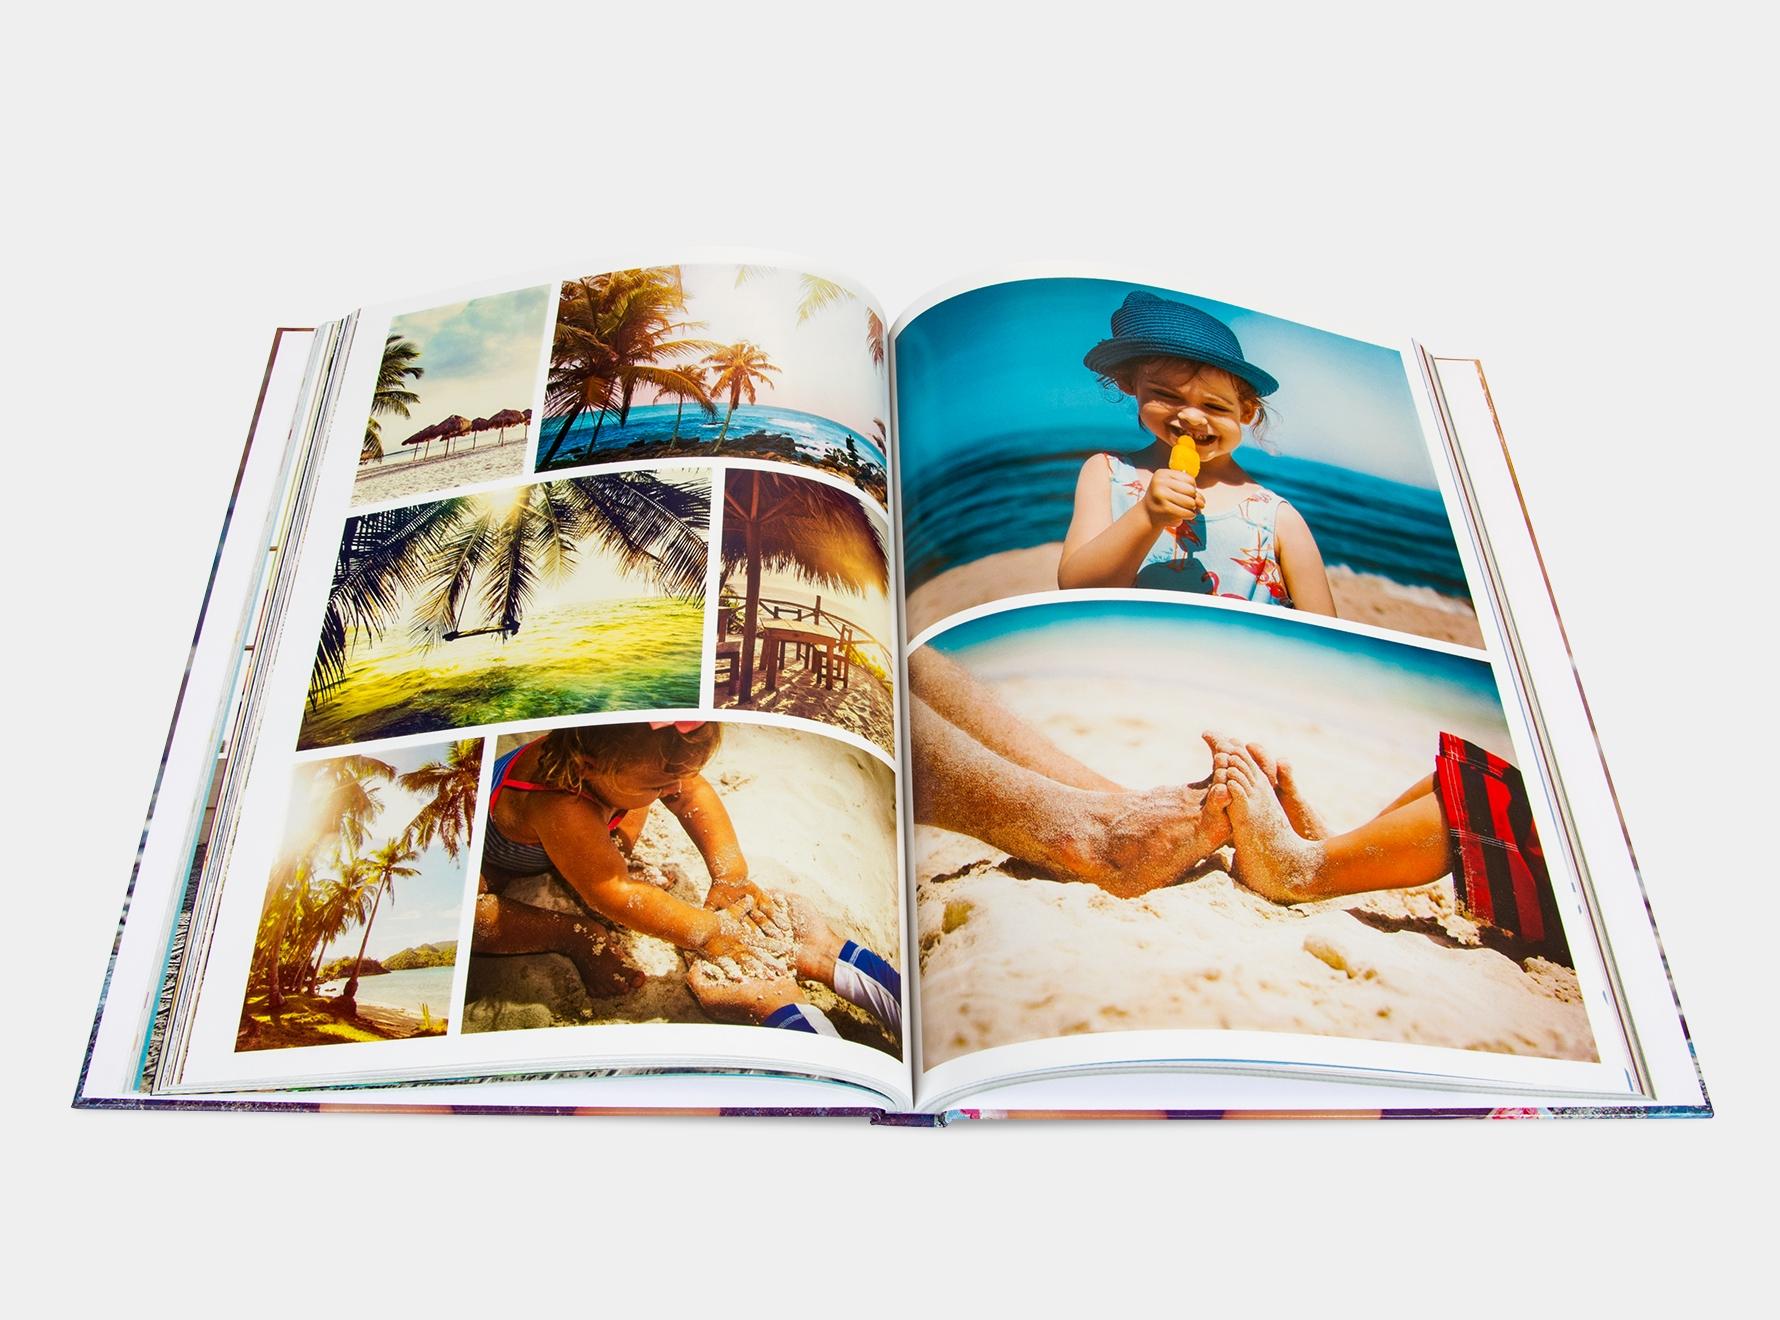 myphotobook Fotobuch Hardcover A4 hoch 24 Seiten (Cover matt)